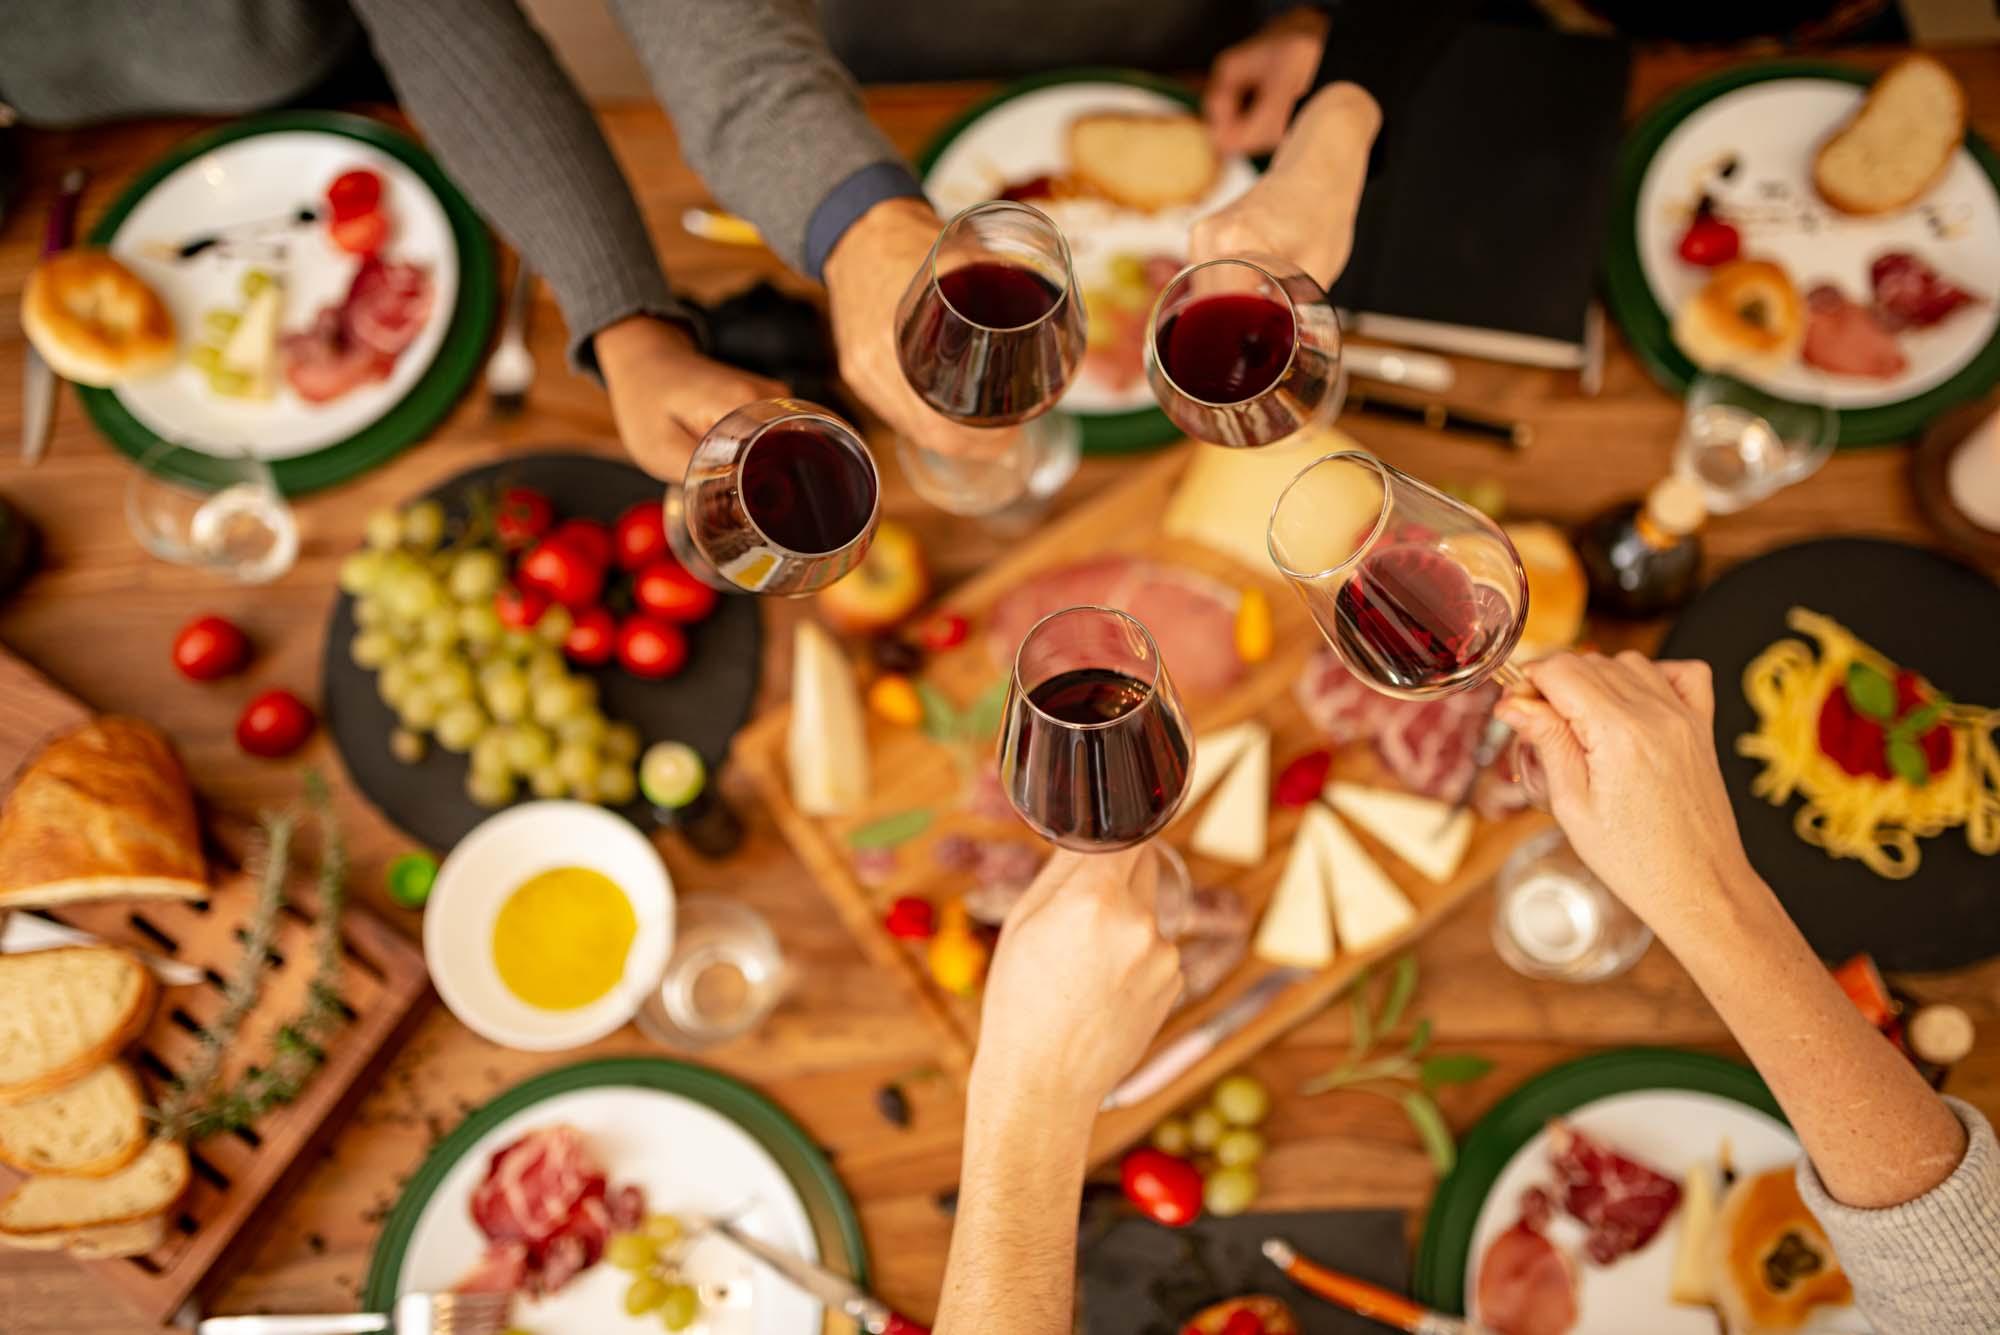 Degustazioni Vino Cene Aziendali a Parma